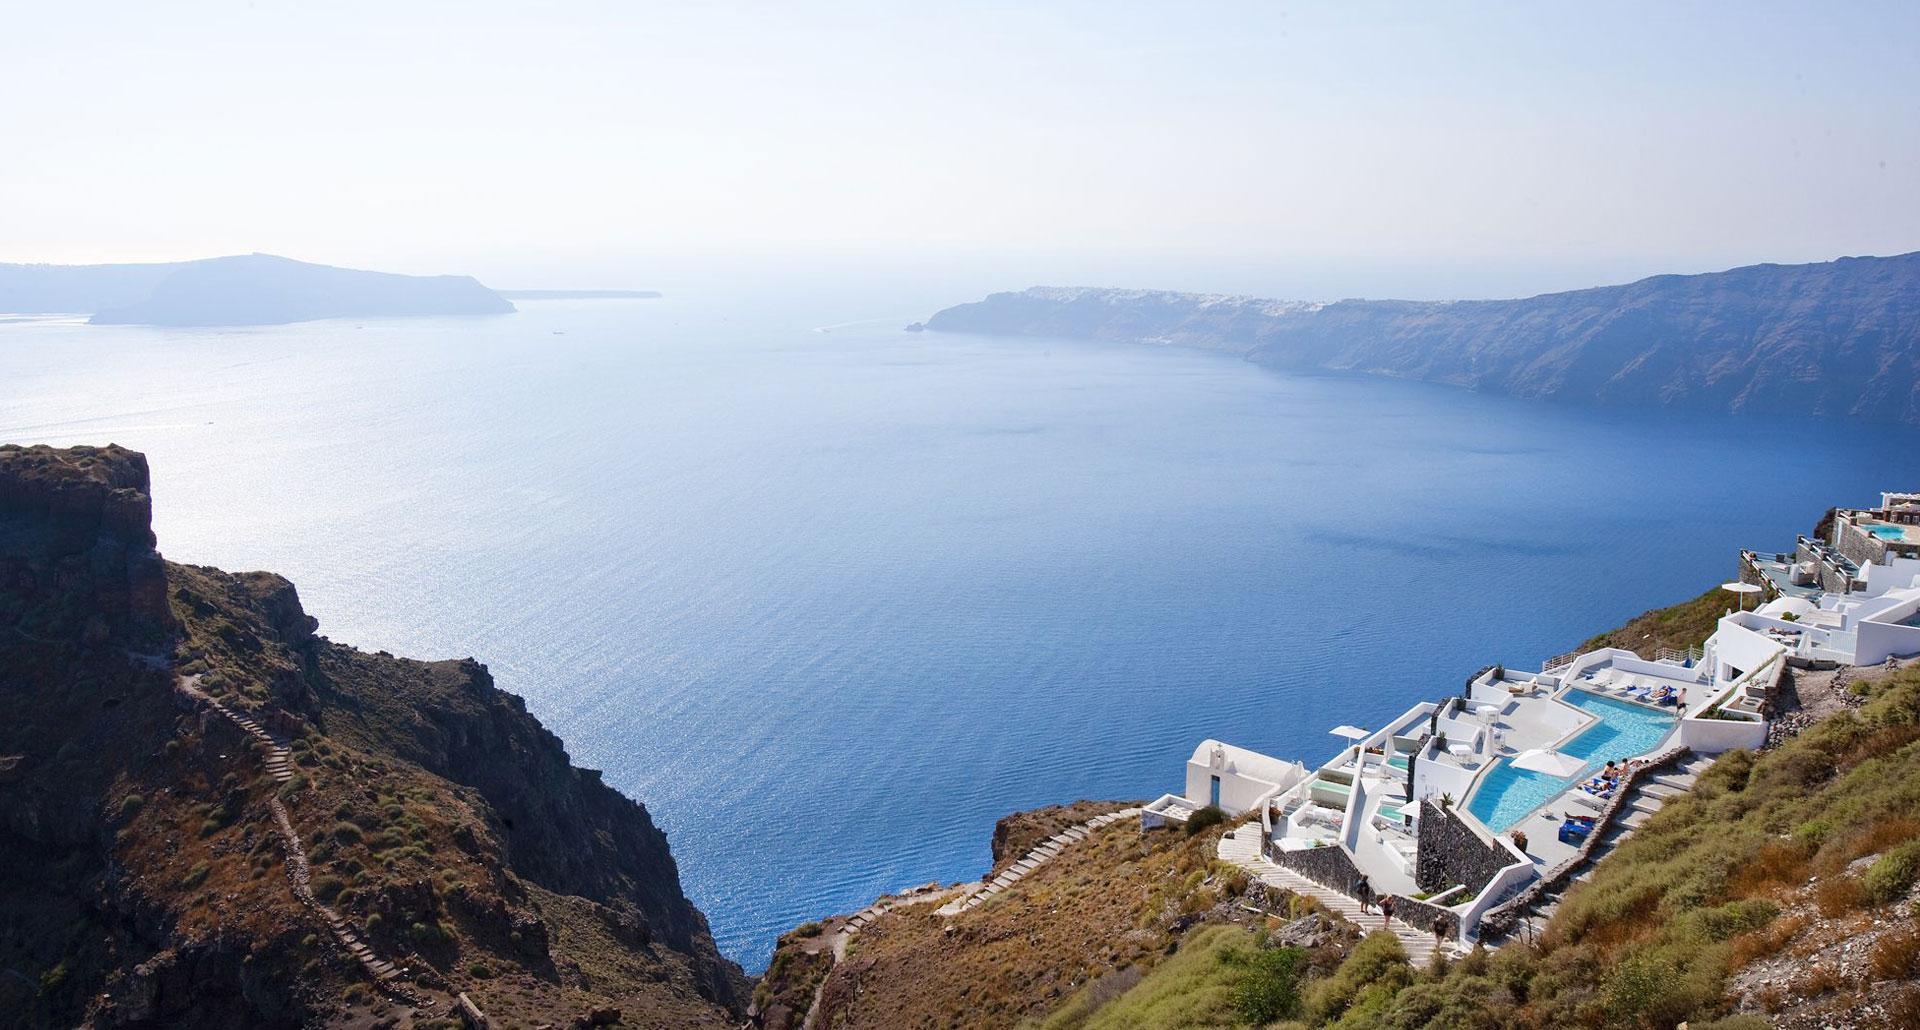 Grace Santorini - boutique hotel & resort in Santorini, Greece